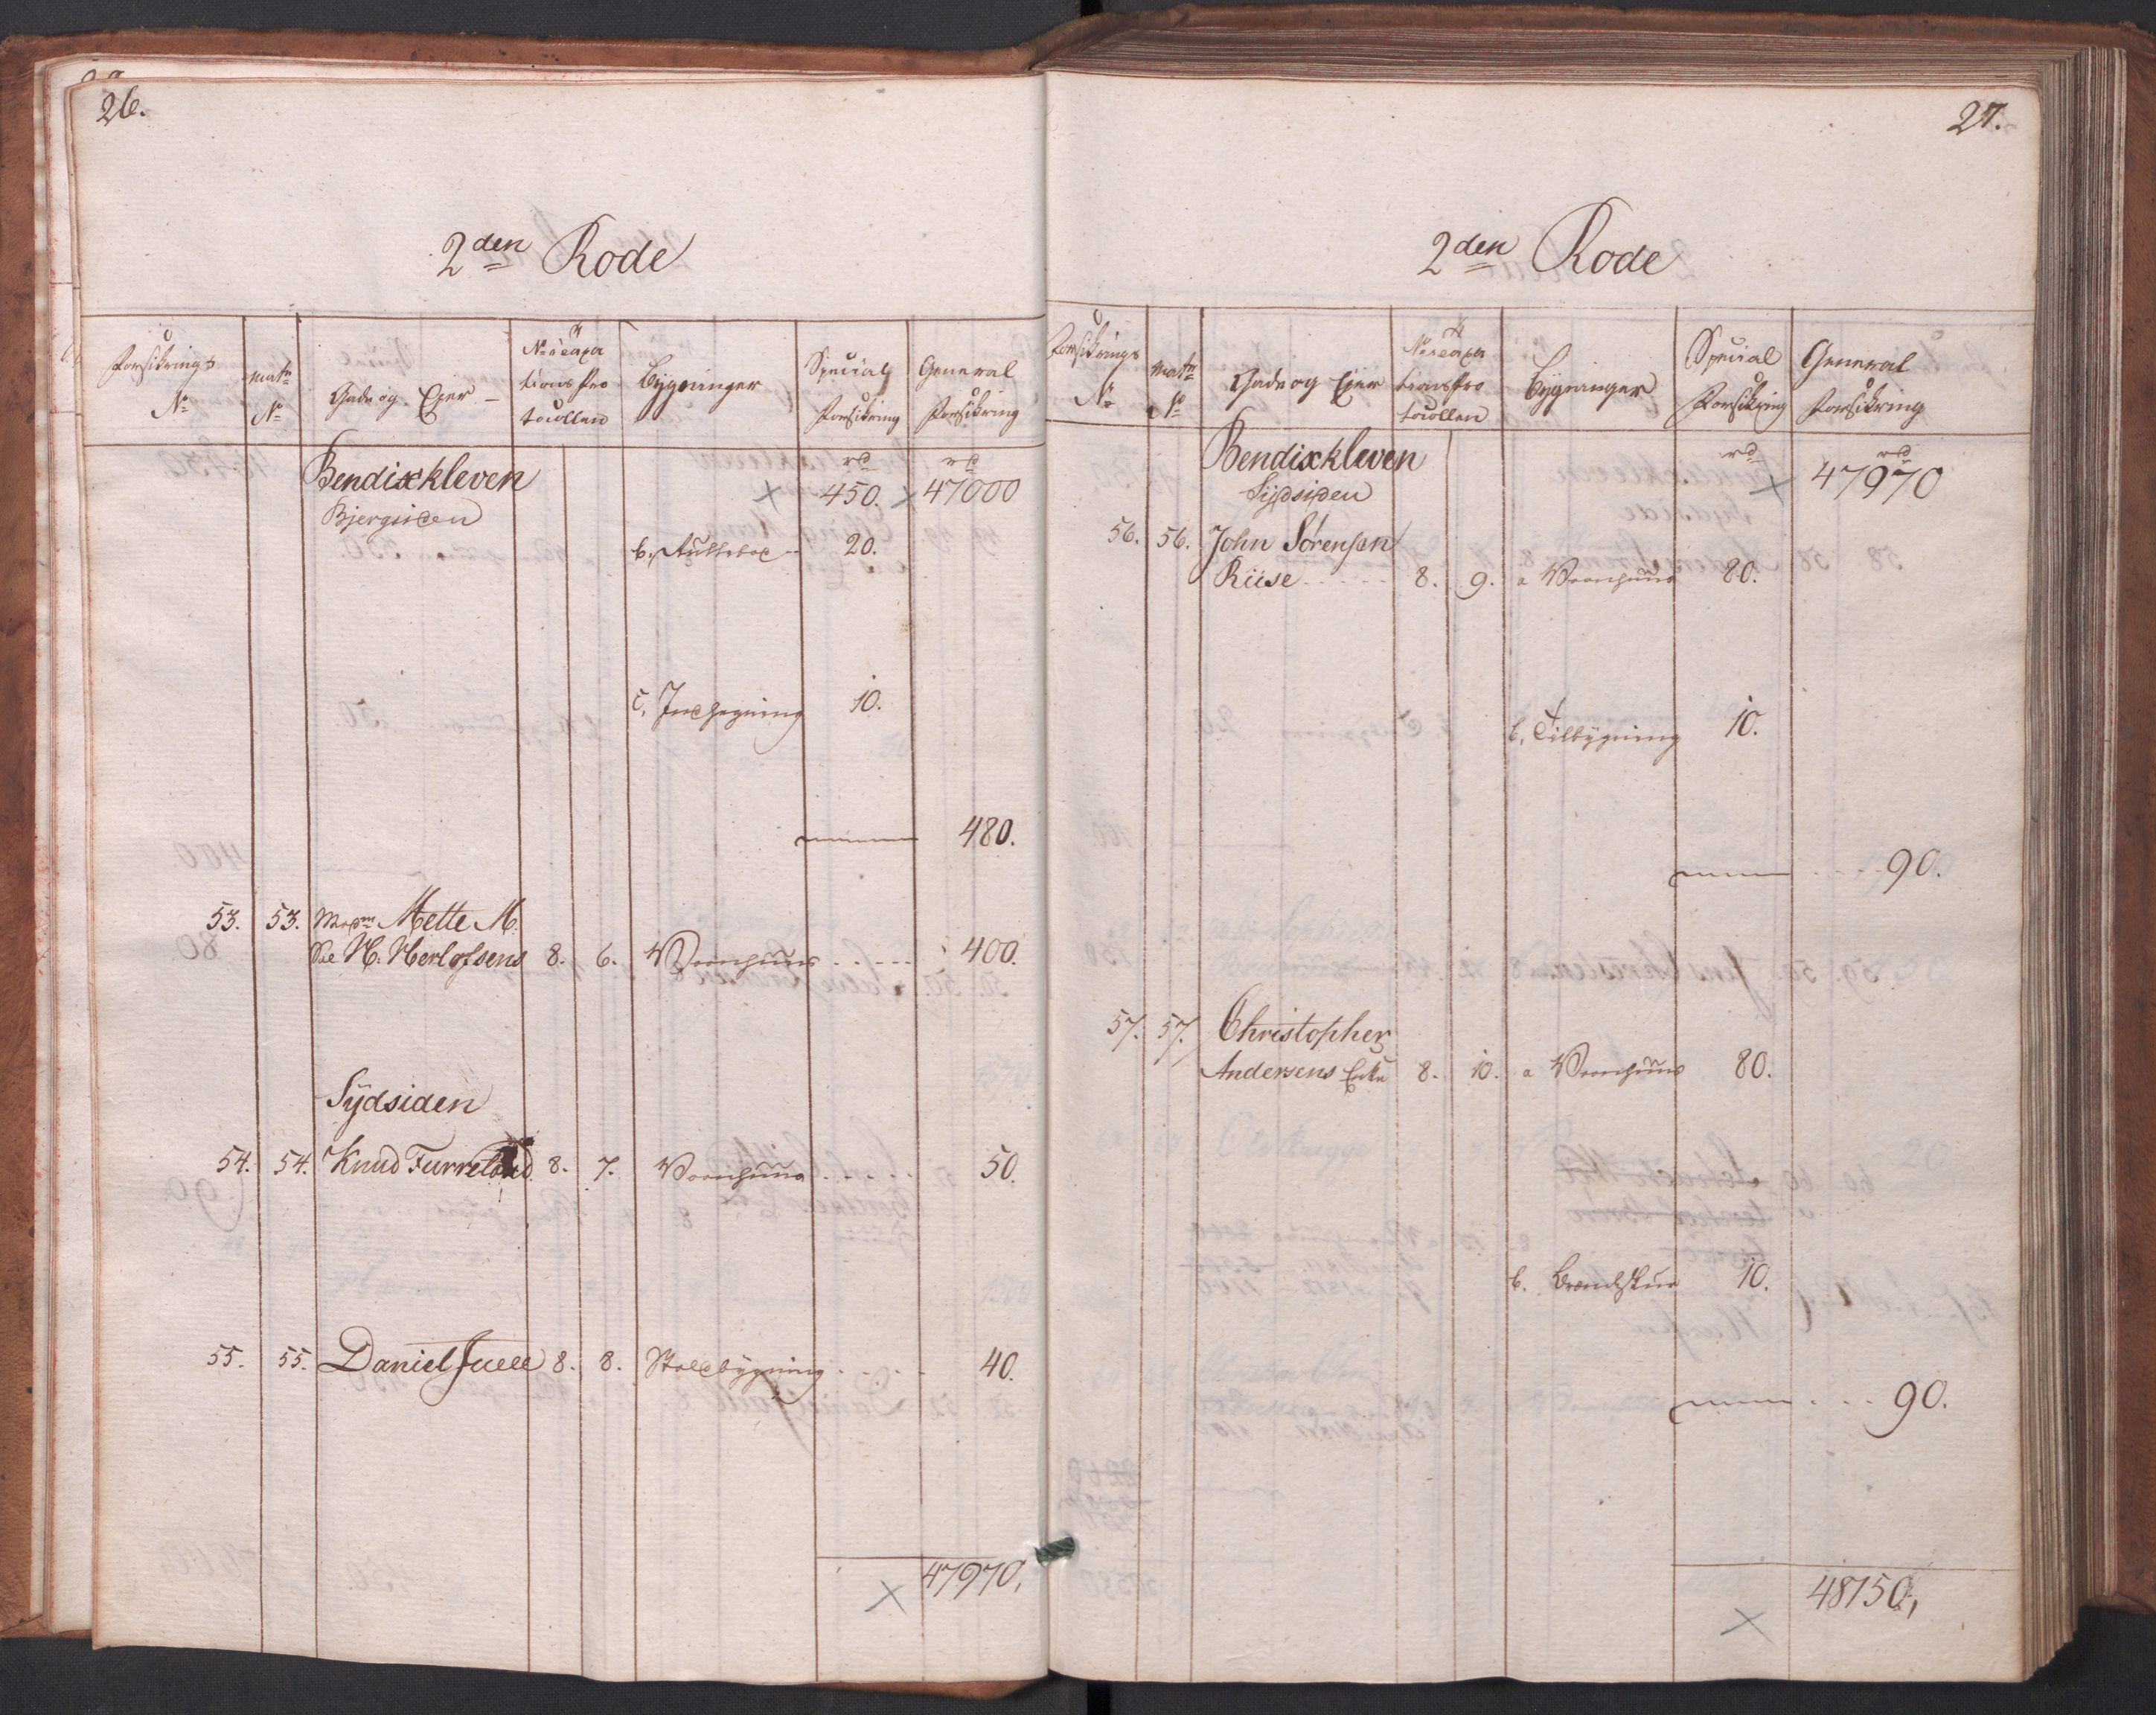 RA, Kommersekollegiet, Brannforsikringskontoret 1767-1814, F/Fa/L0003: Arendal, 1807-1817, s. 26-27